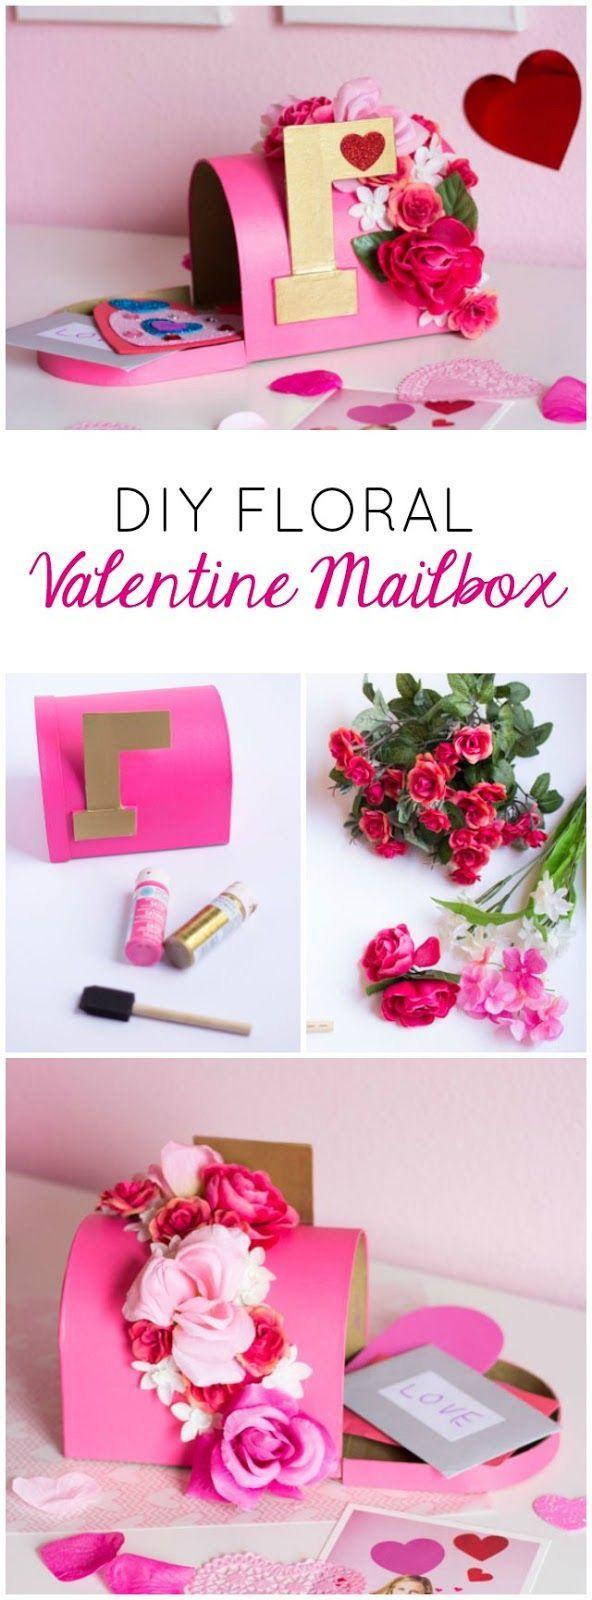 DIY Floral Valentine Mailbox | Design Improvised